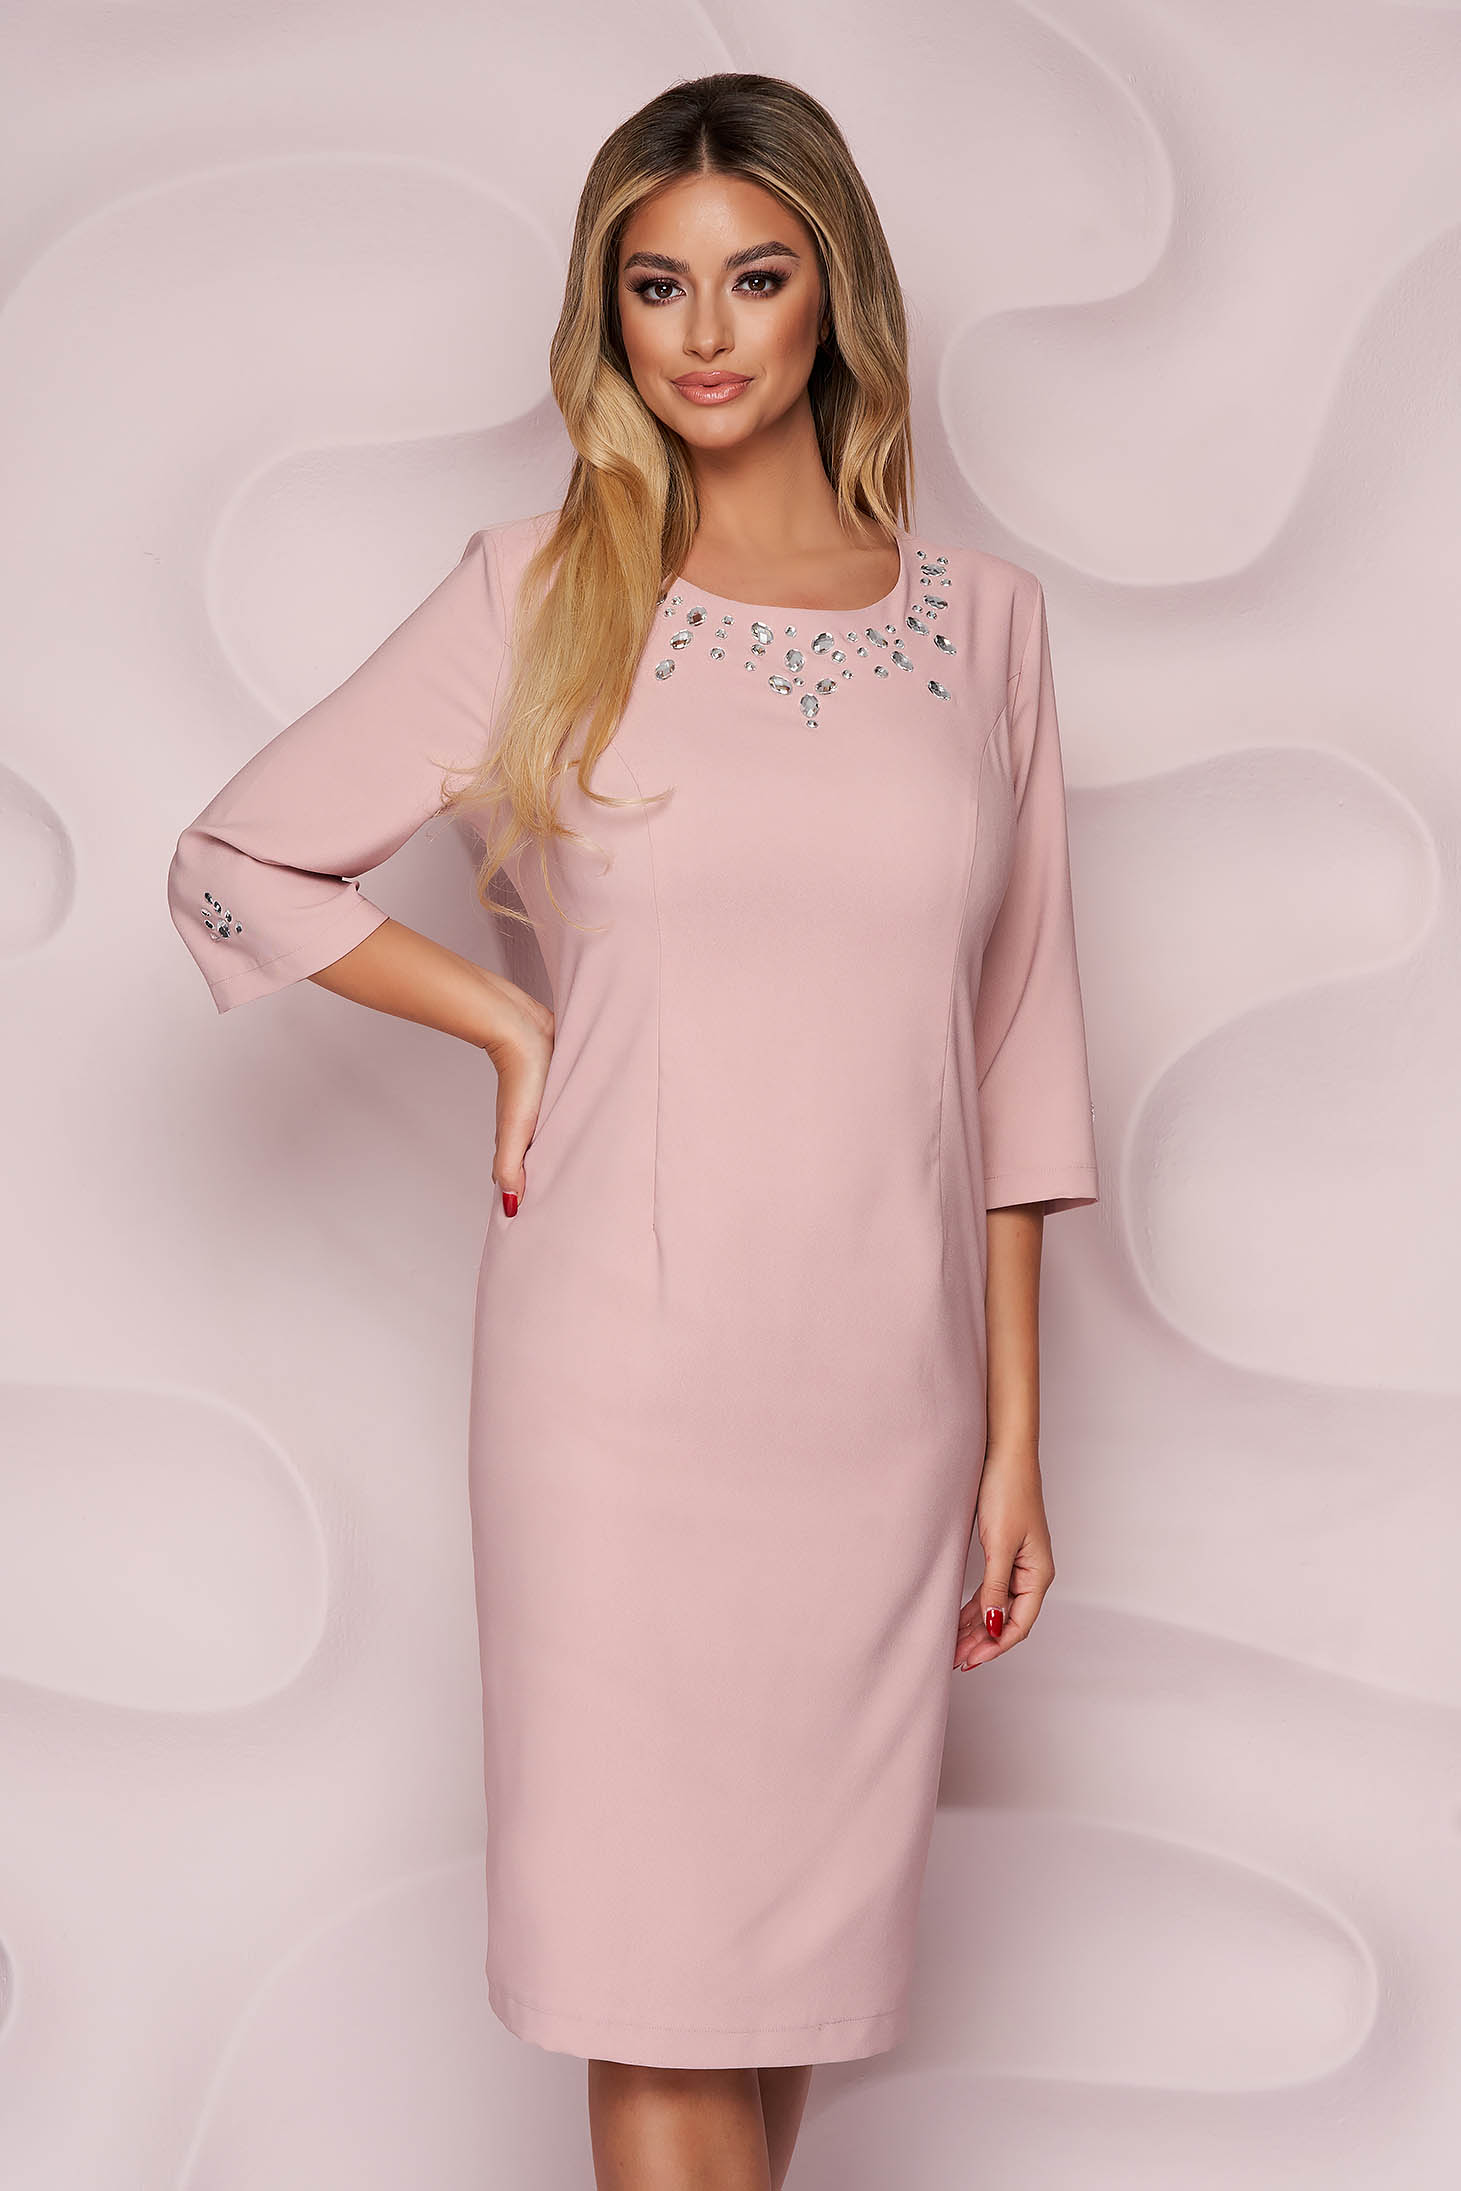 Lightpink dress elegant straight midi cloth with crystal embellished details nonelastic fabric